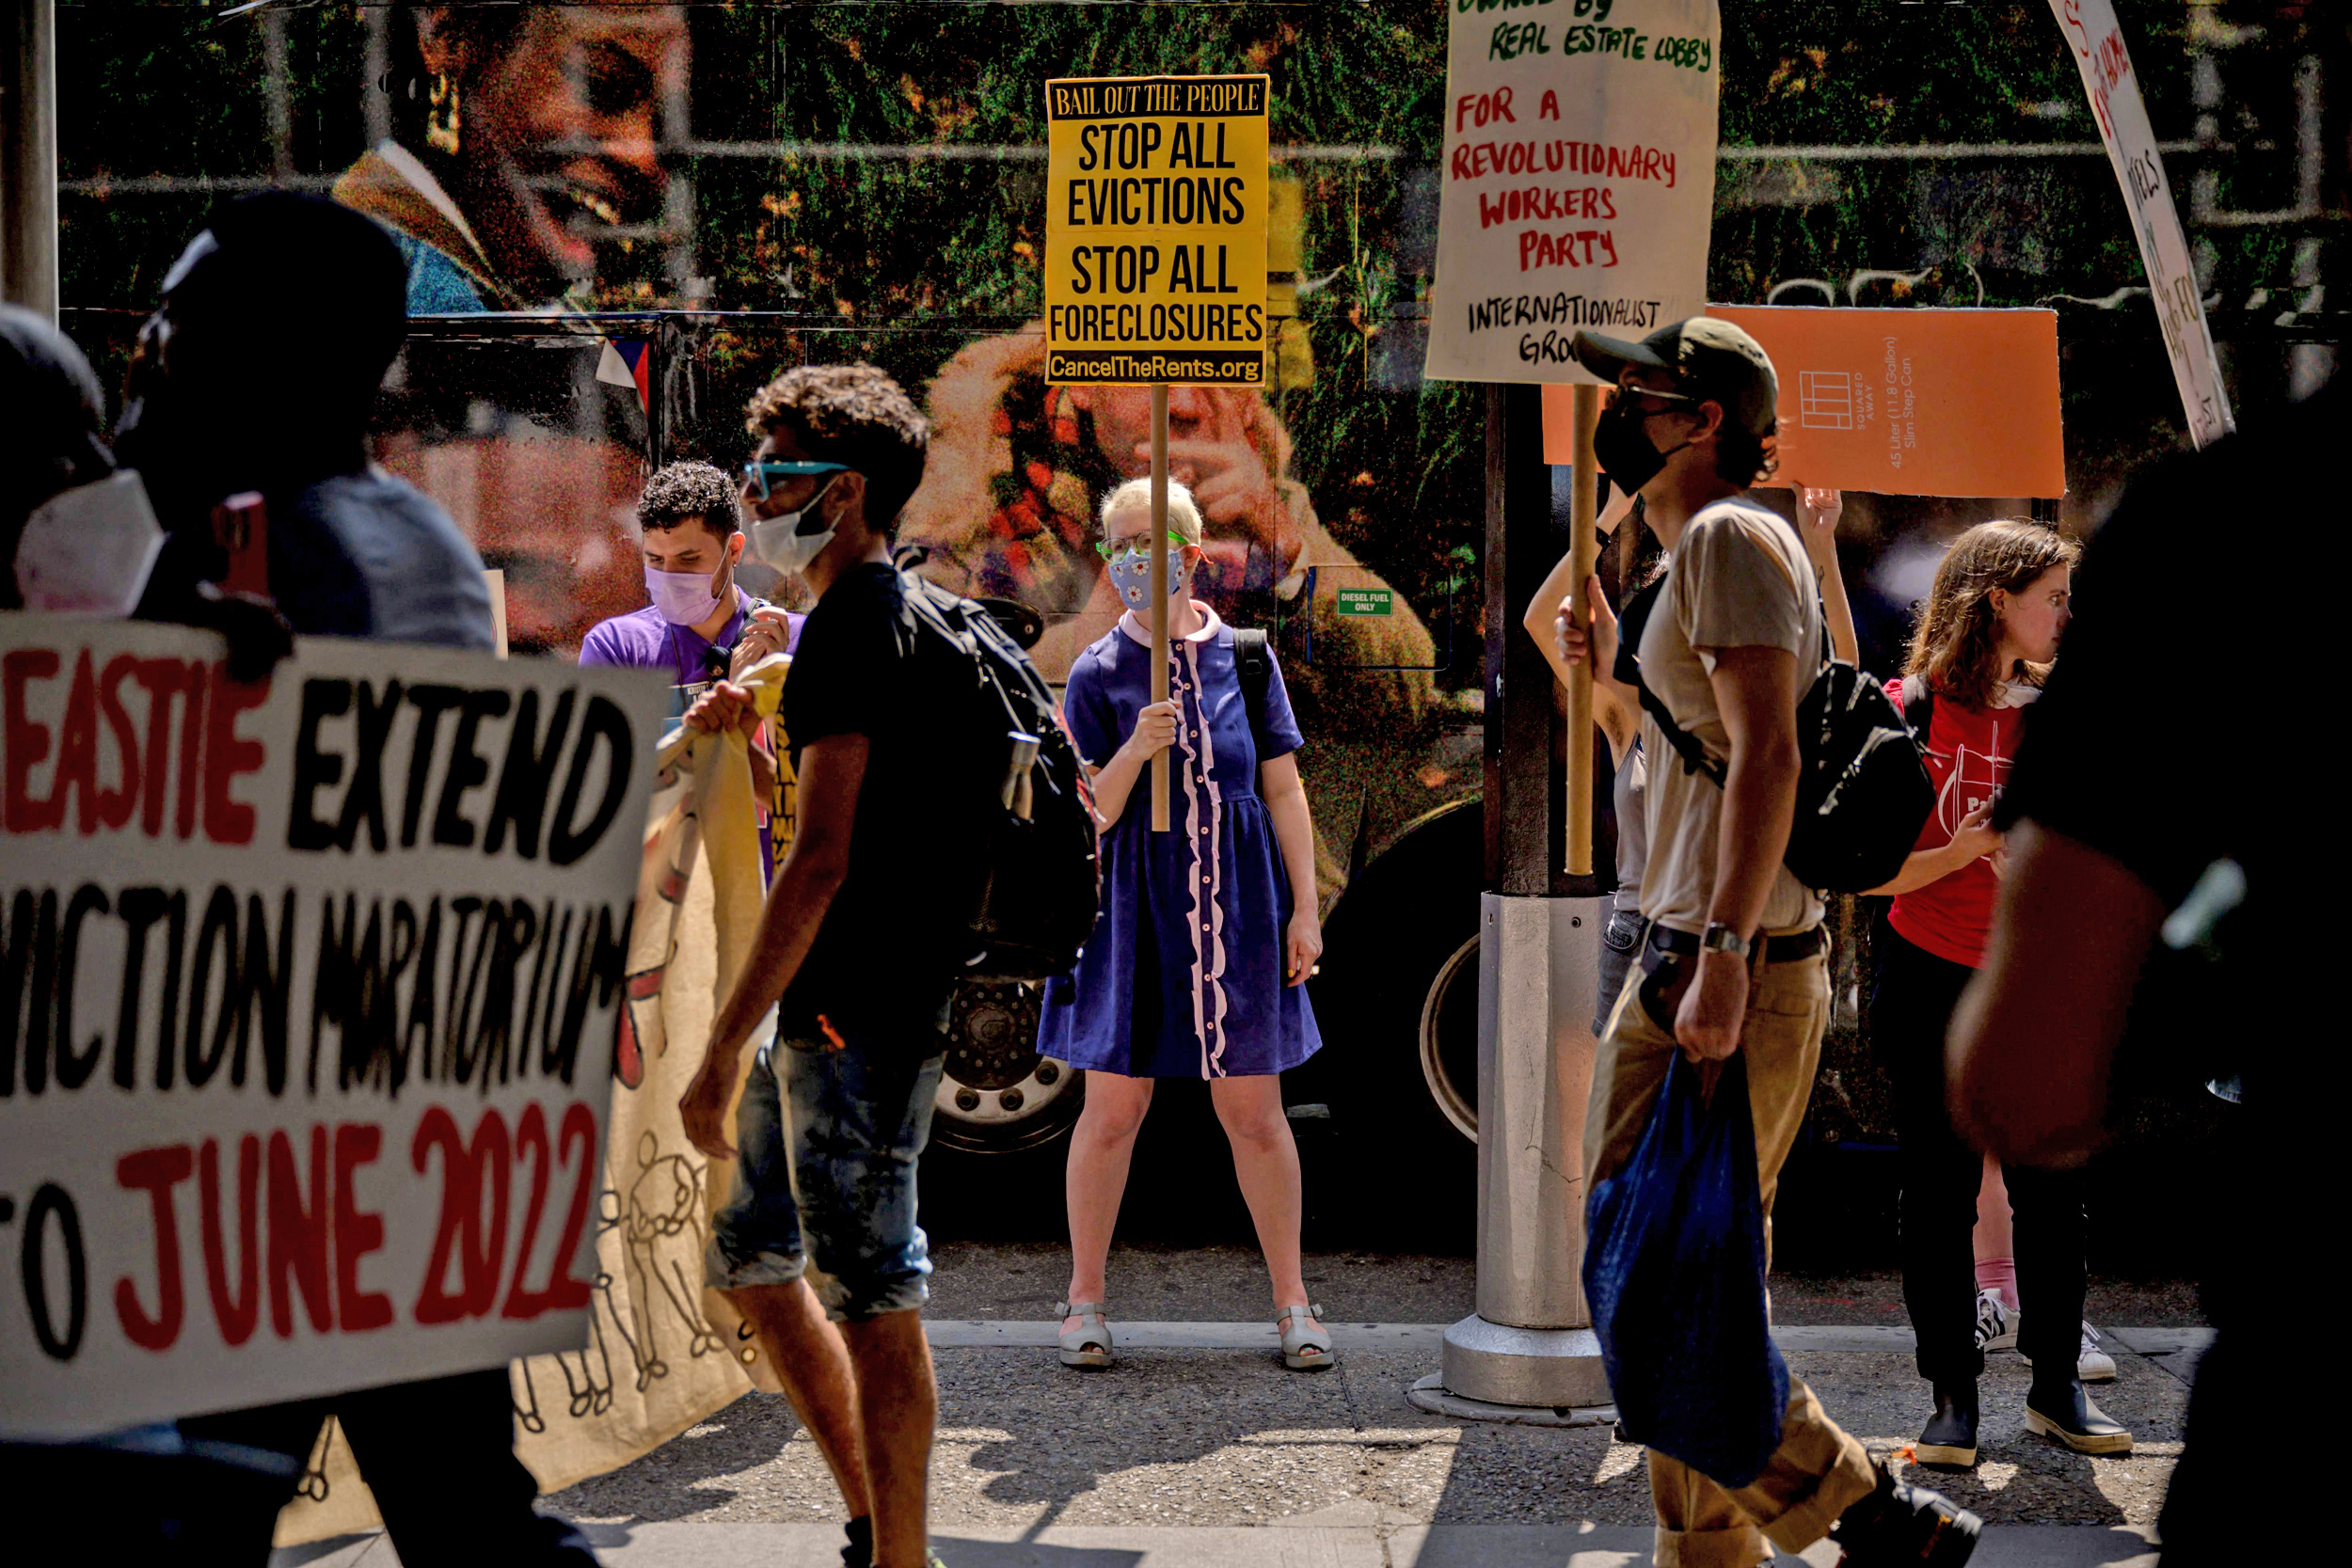 Federal judge won't block Biden administration's new eviction moratorium